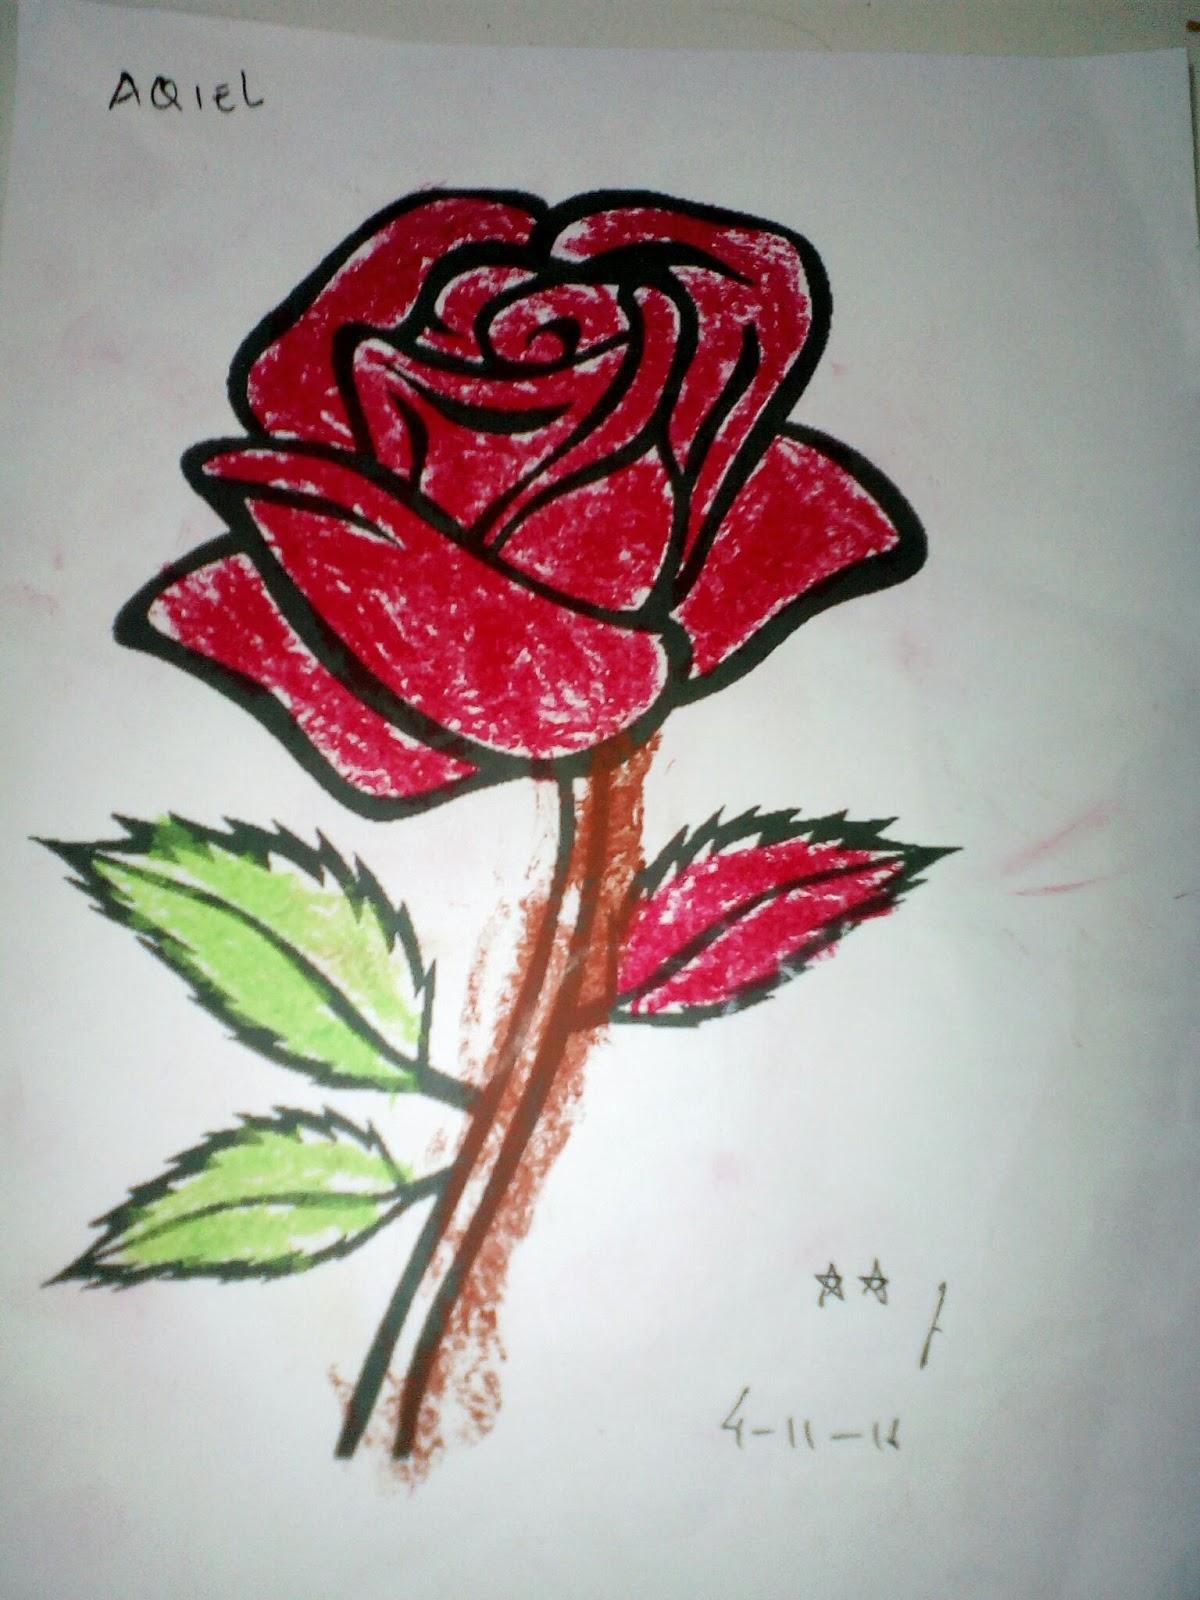 Menggambar Bunga Mawar : menggambar, bunga, mawar, Contoh, Gambar, Kolase, Bunga, Mawar, Lengkap, Kumpulan, Wallpaper